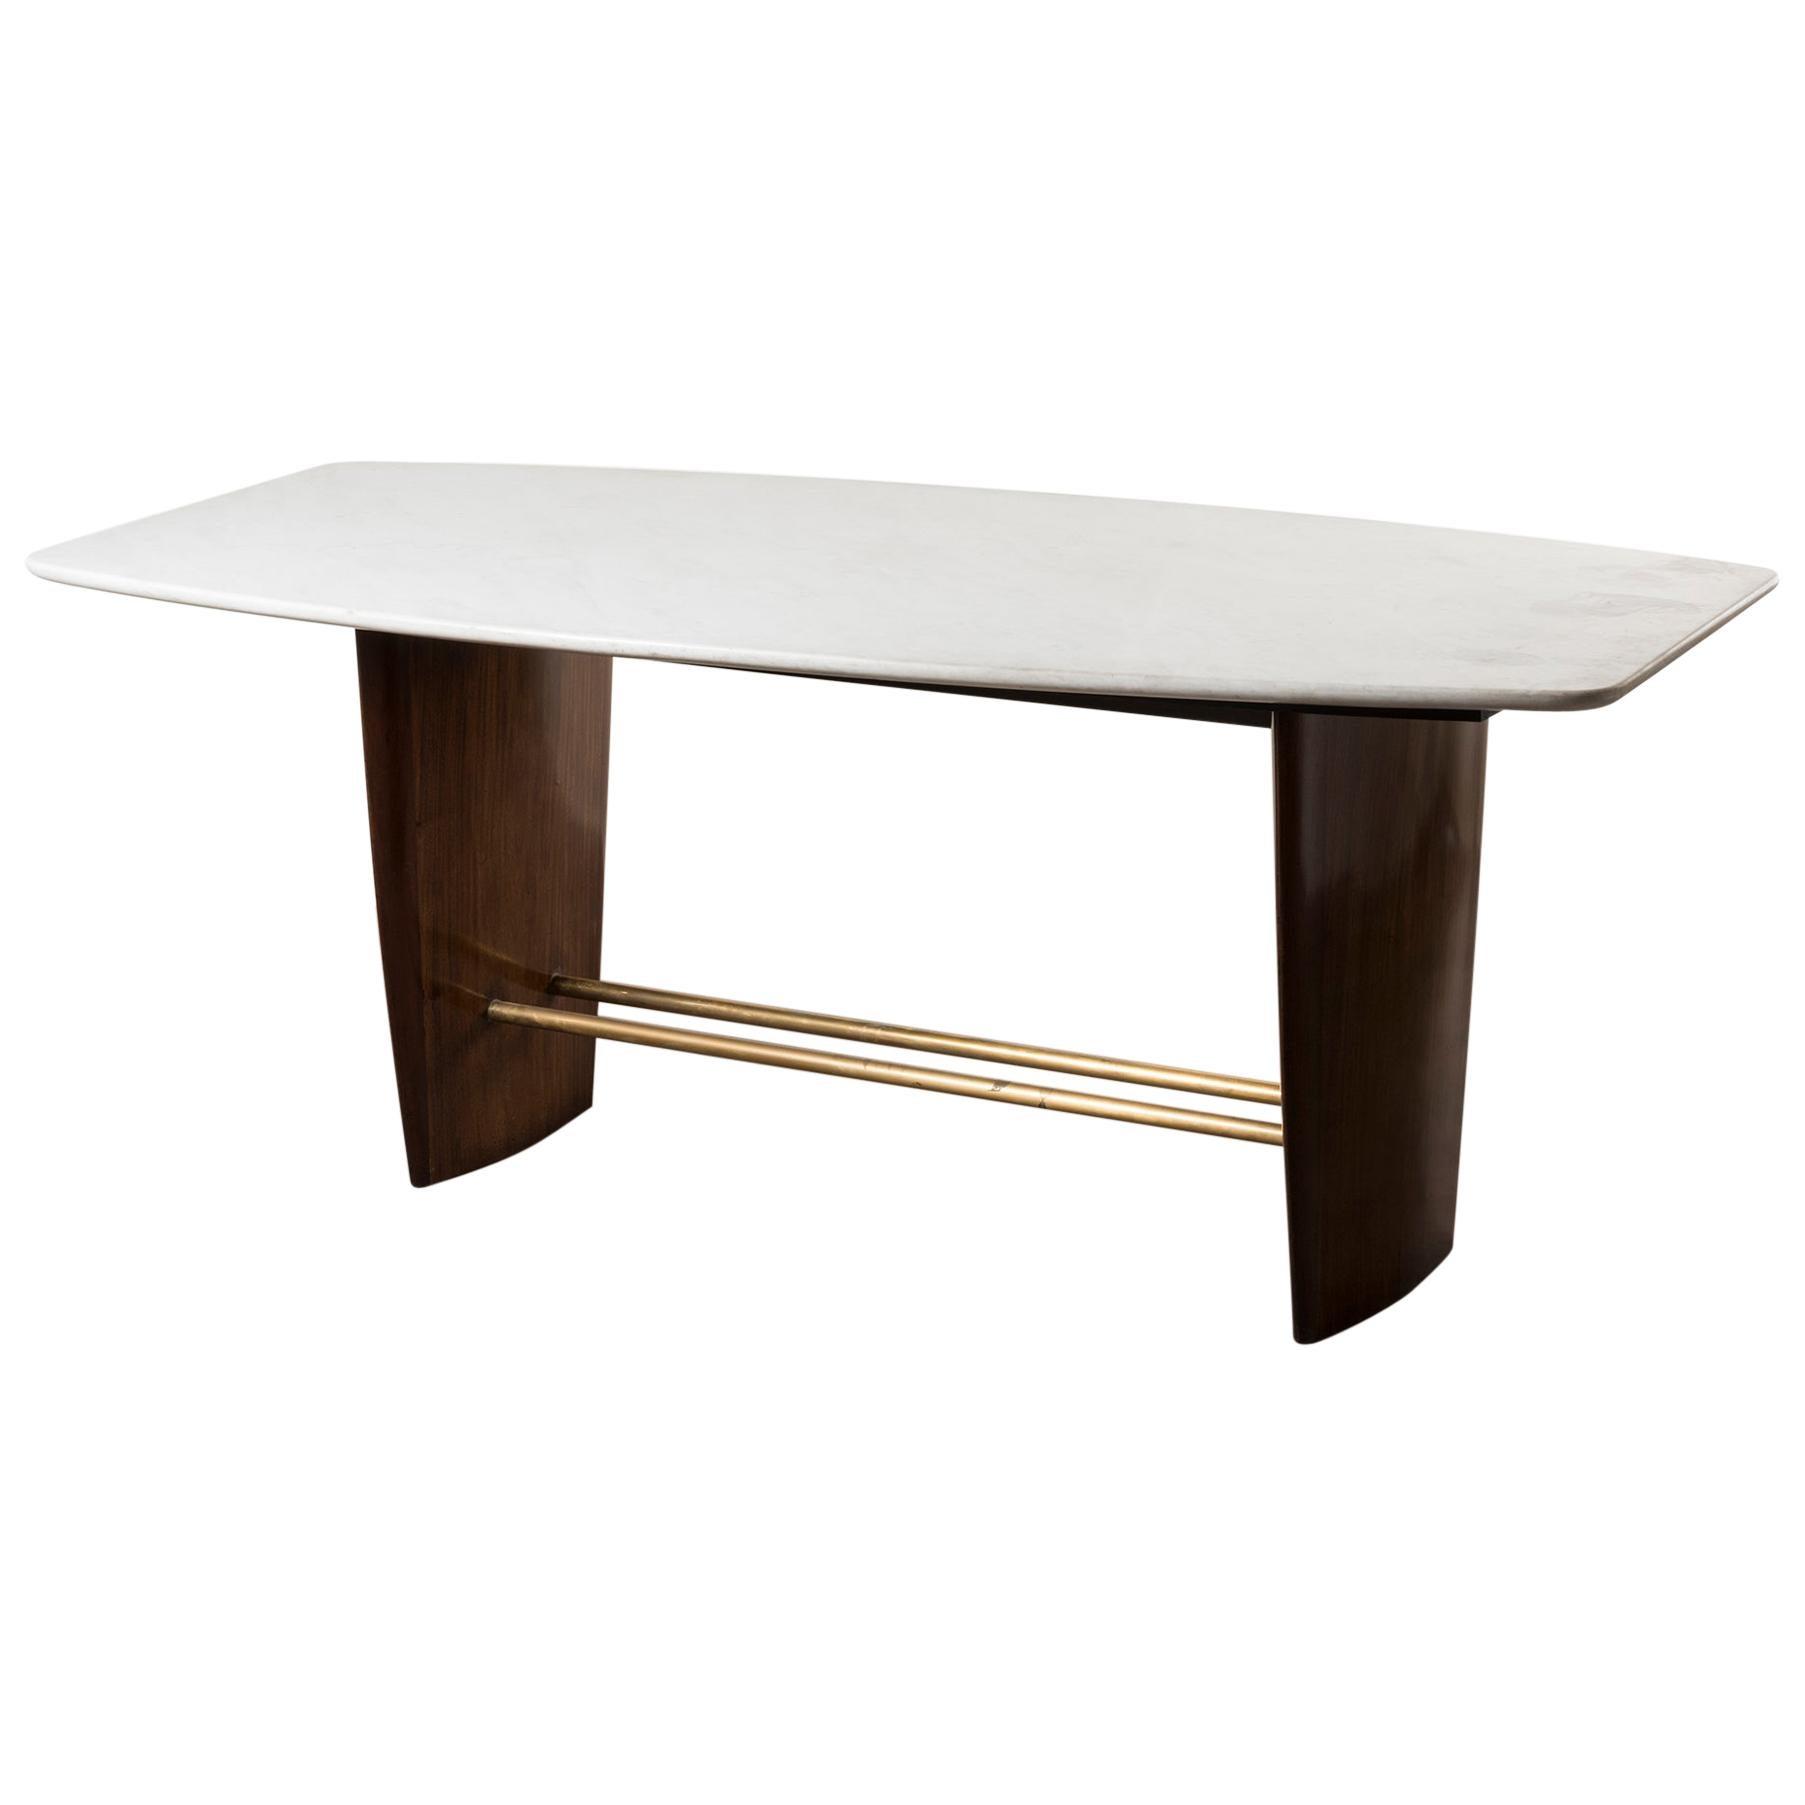 Table by Joaquim Tenreiro